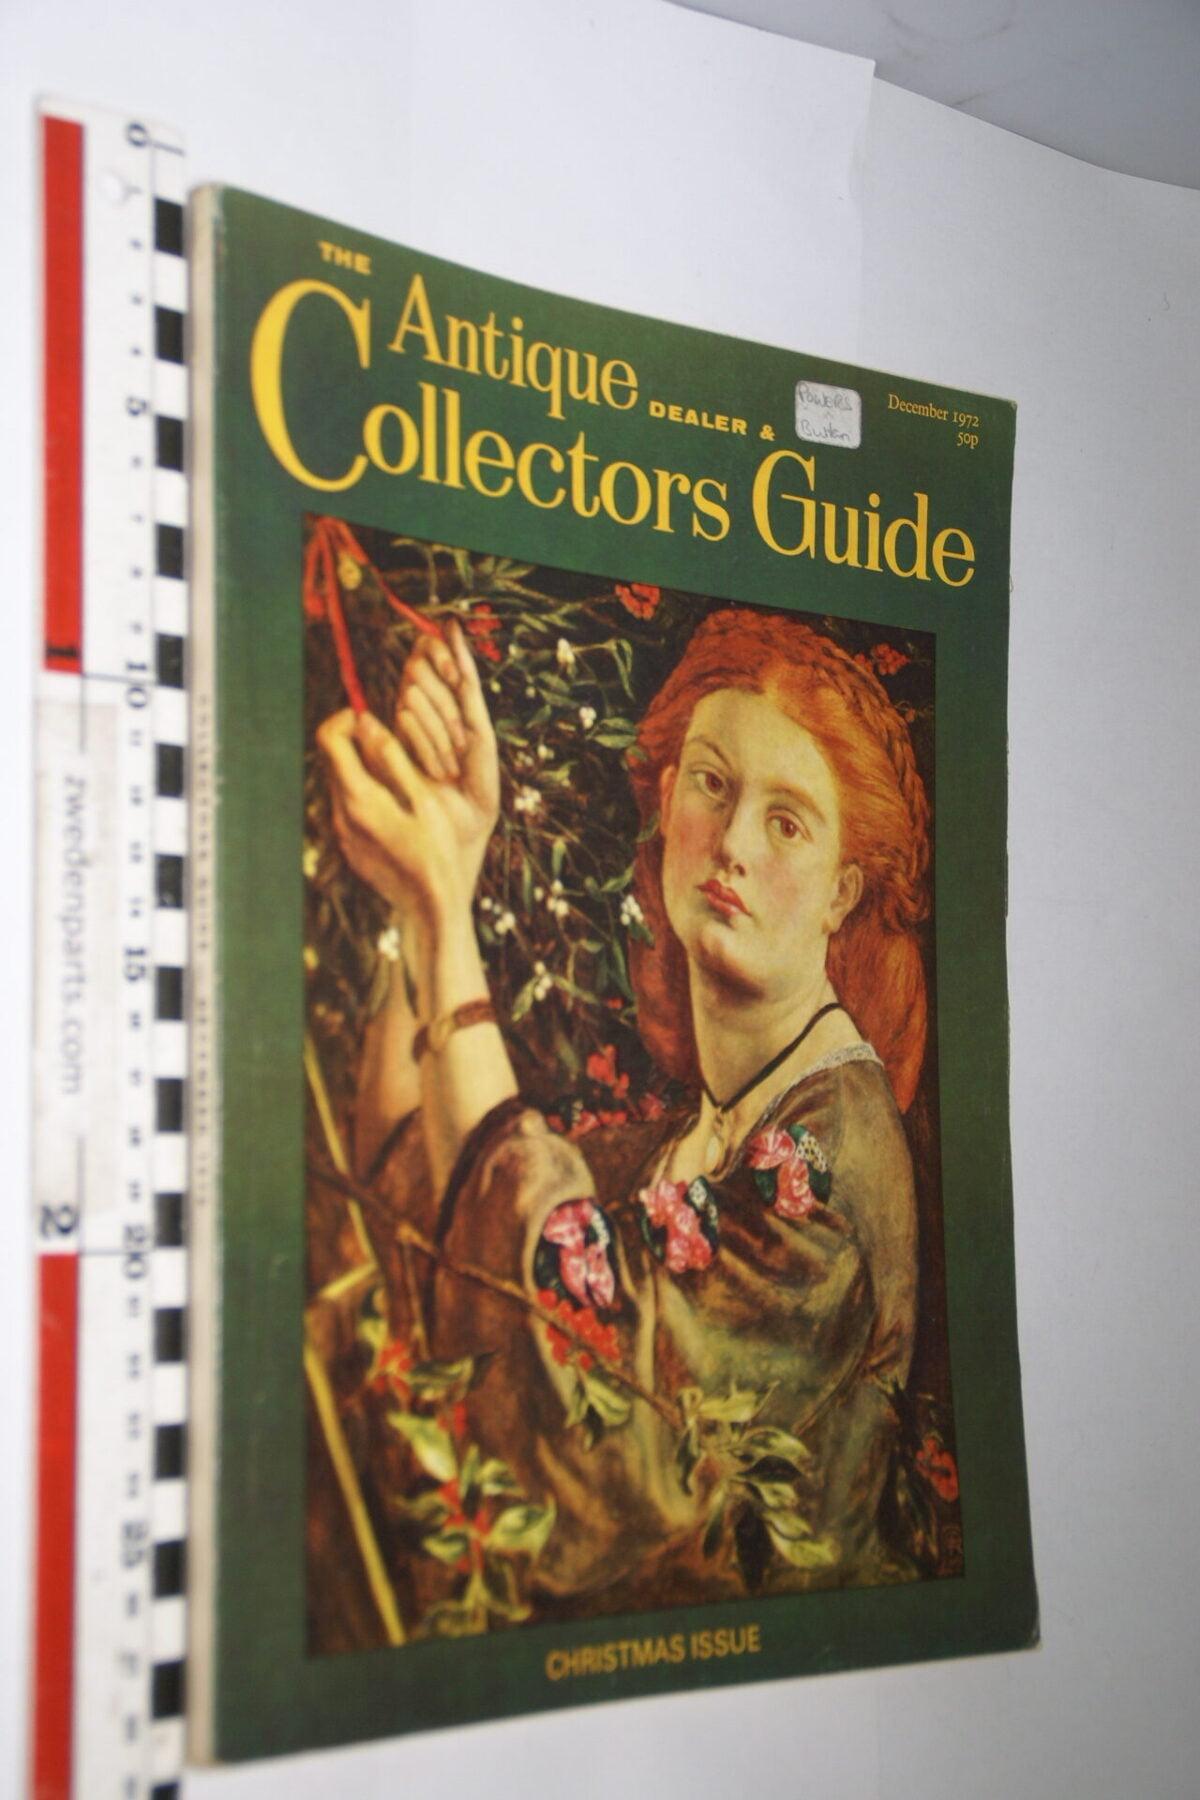 DSC06244 1972 december tijdschrift Antique Collectors Guide, English-7590a476